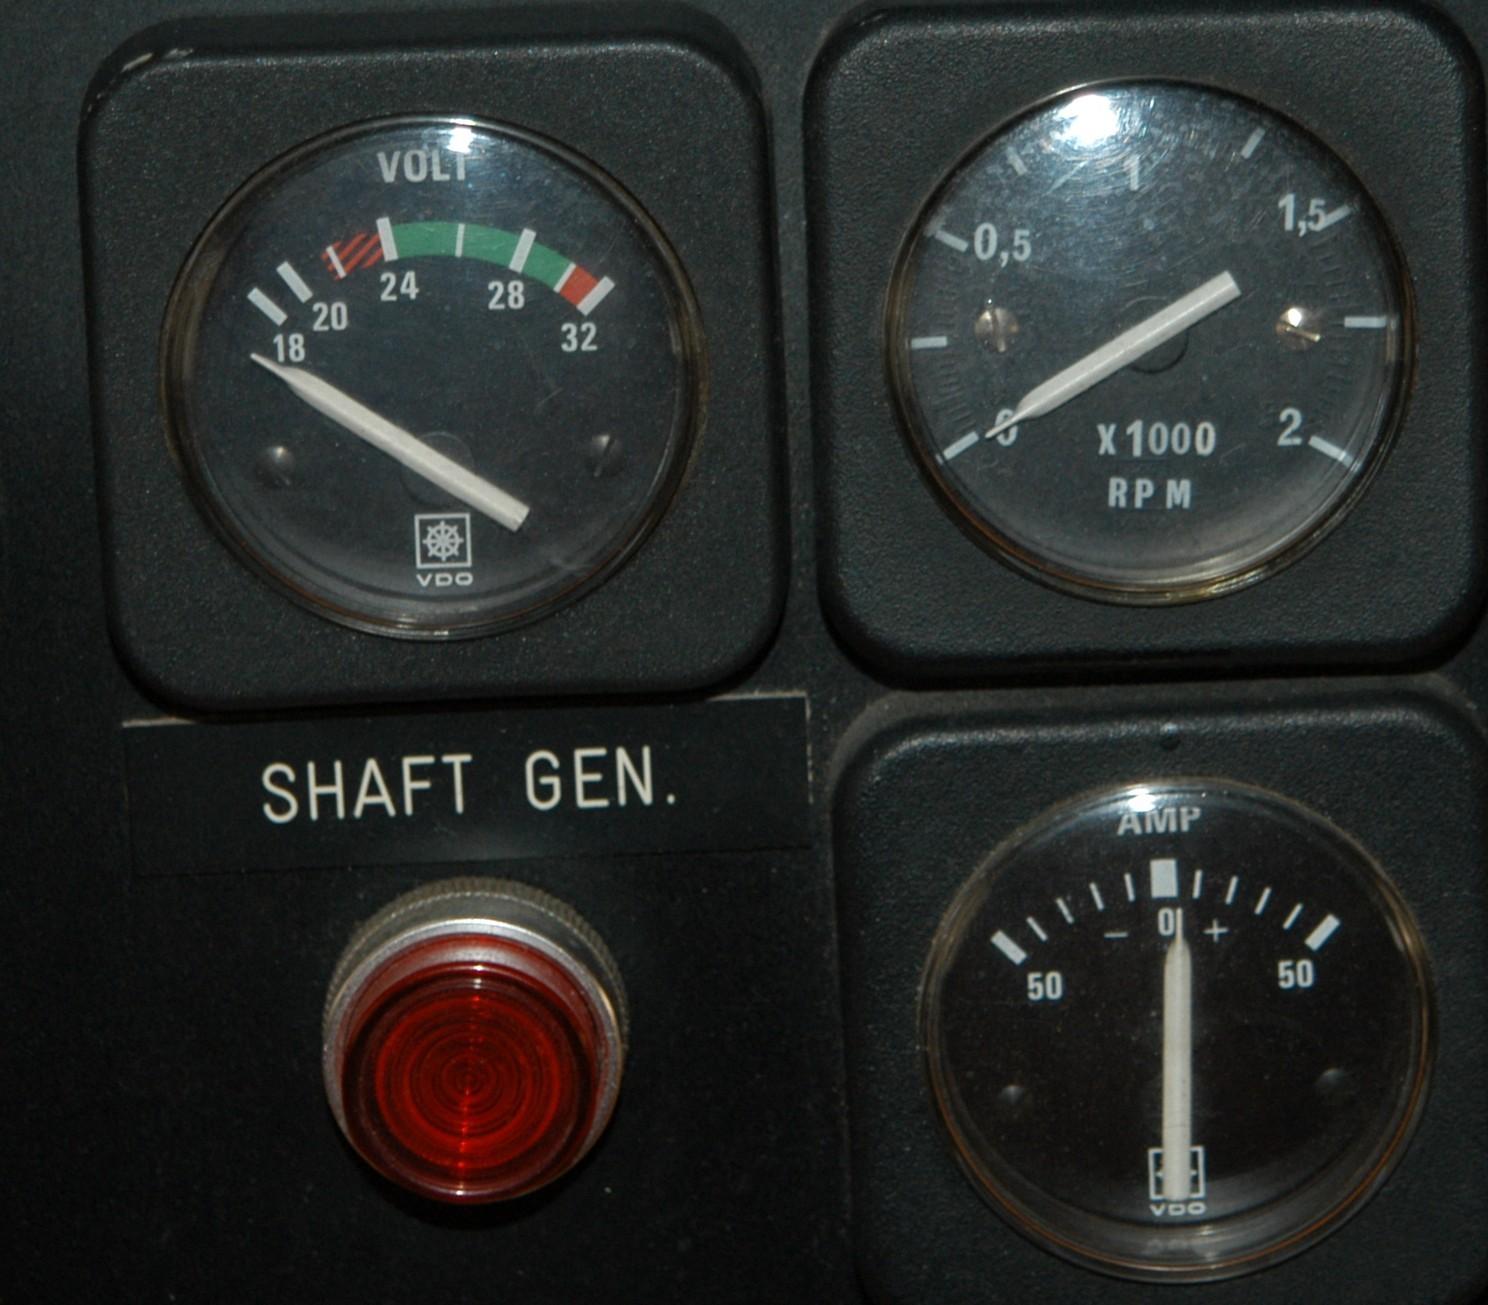 Click image for larger version  Name:Shaft Gen Panel.jpg Views:256 Size:329.1 KB ID:51176